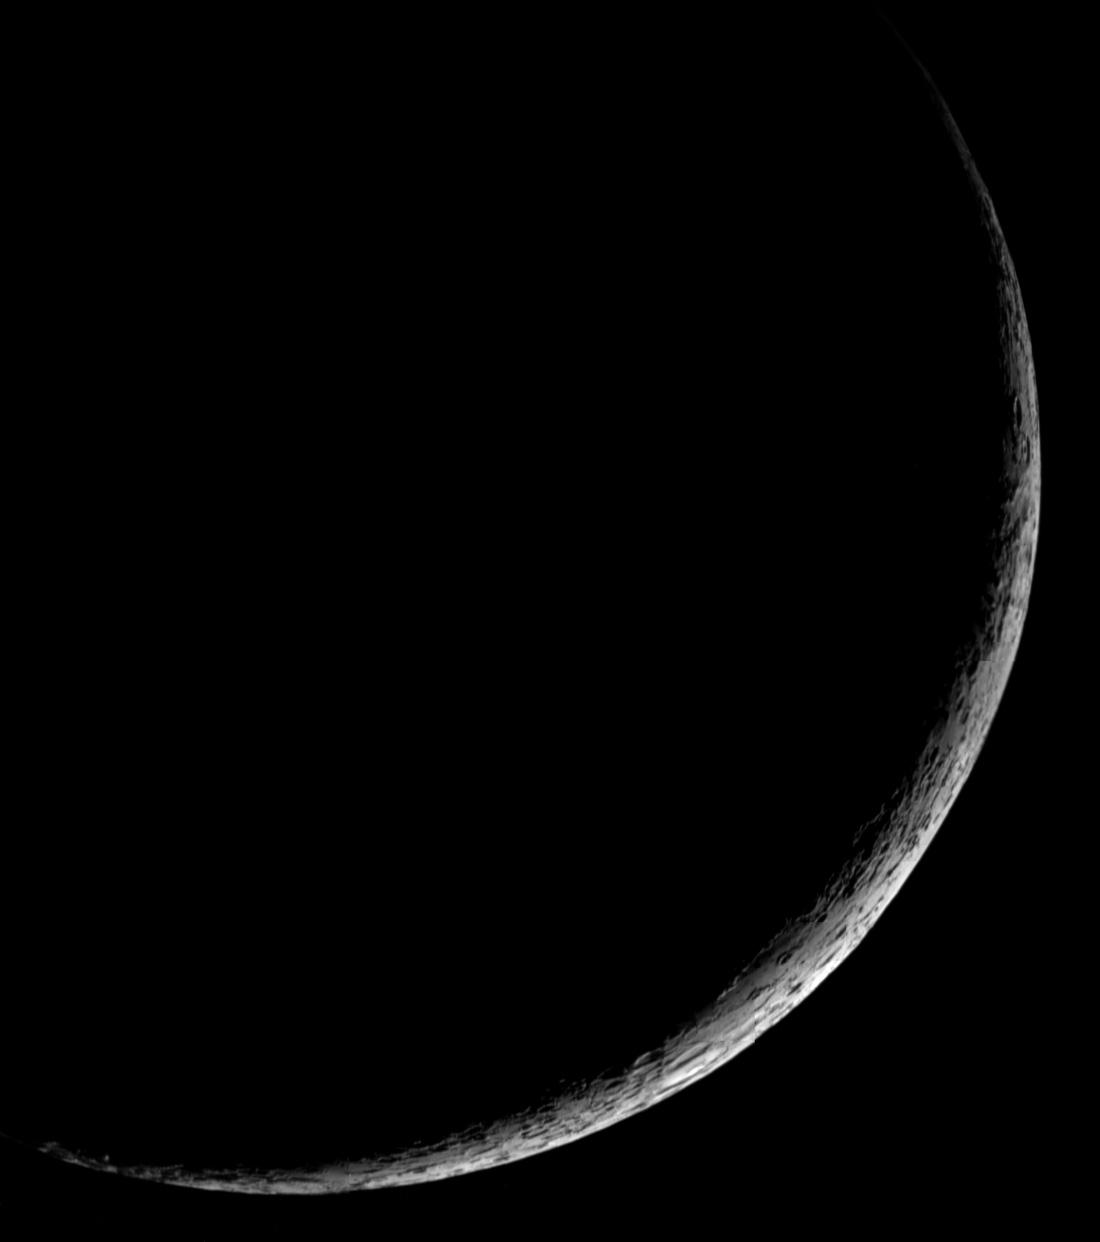 La Lune - Page 29 Mosa_der